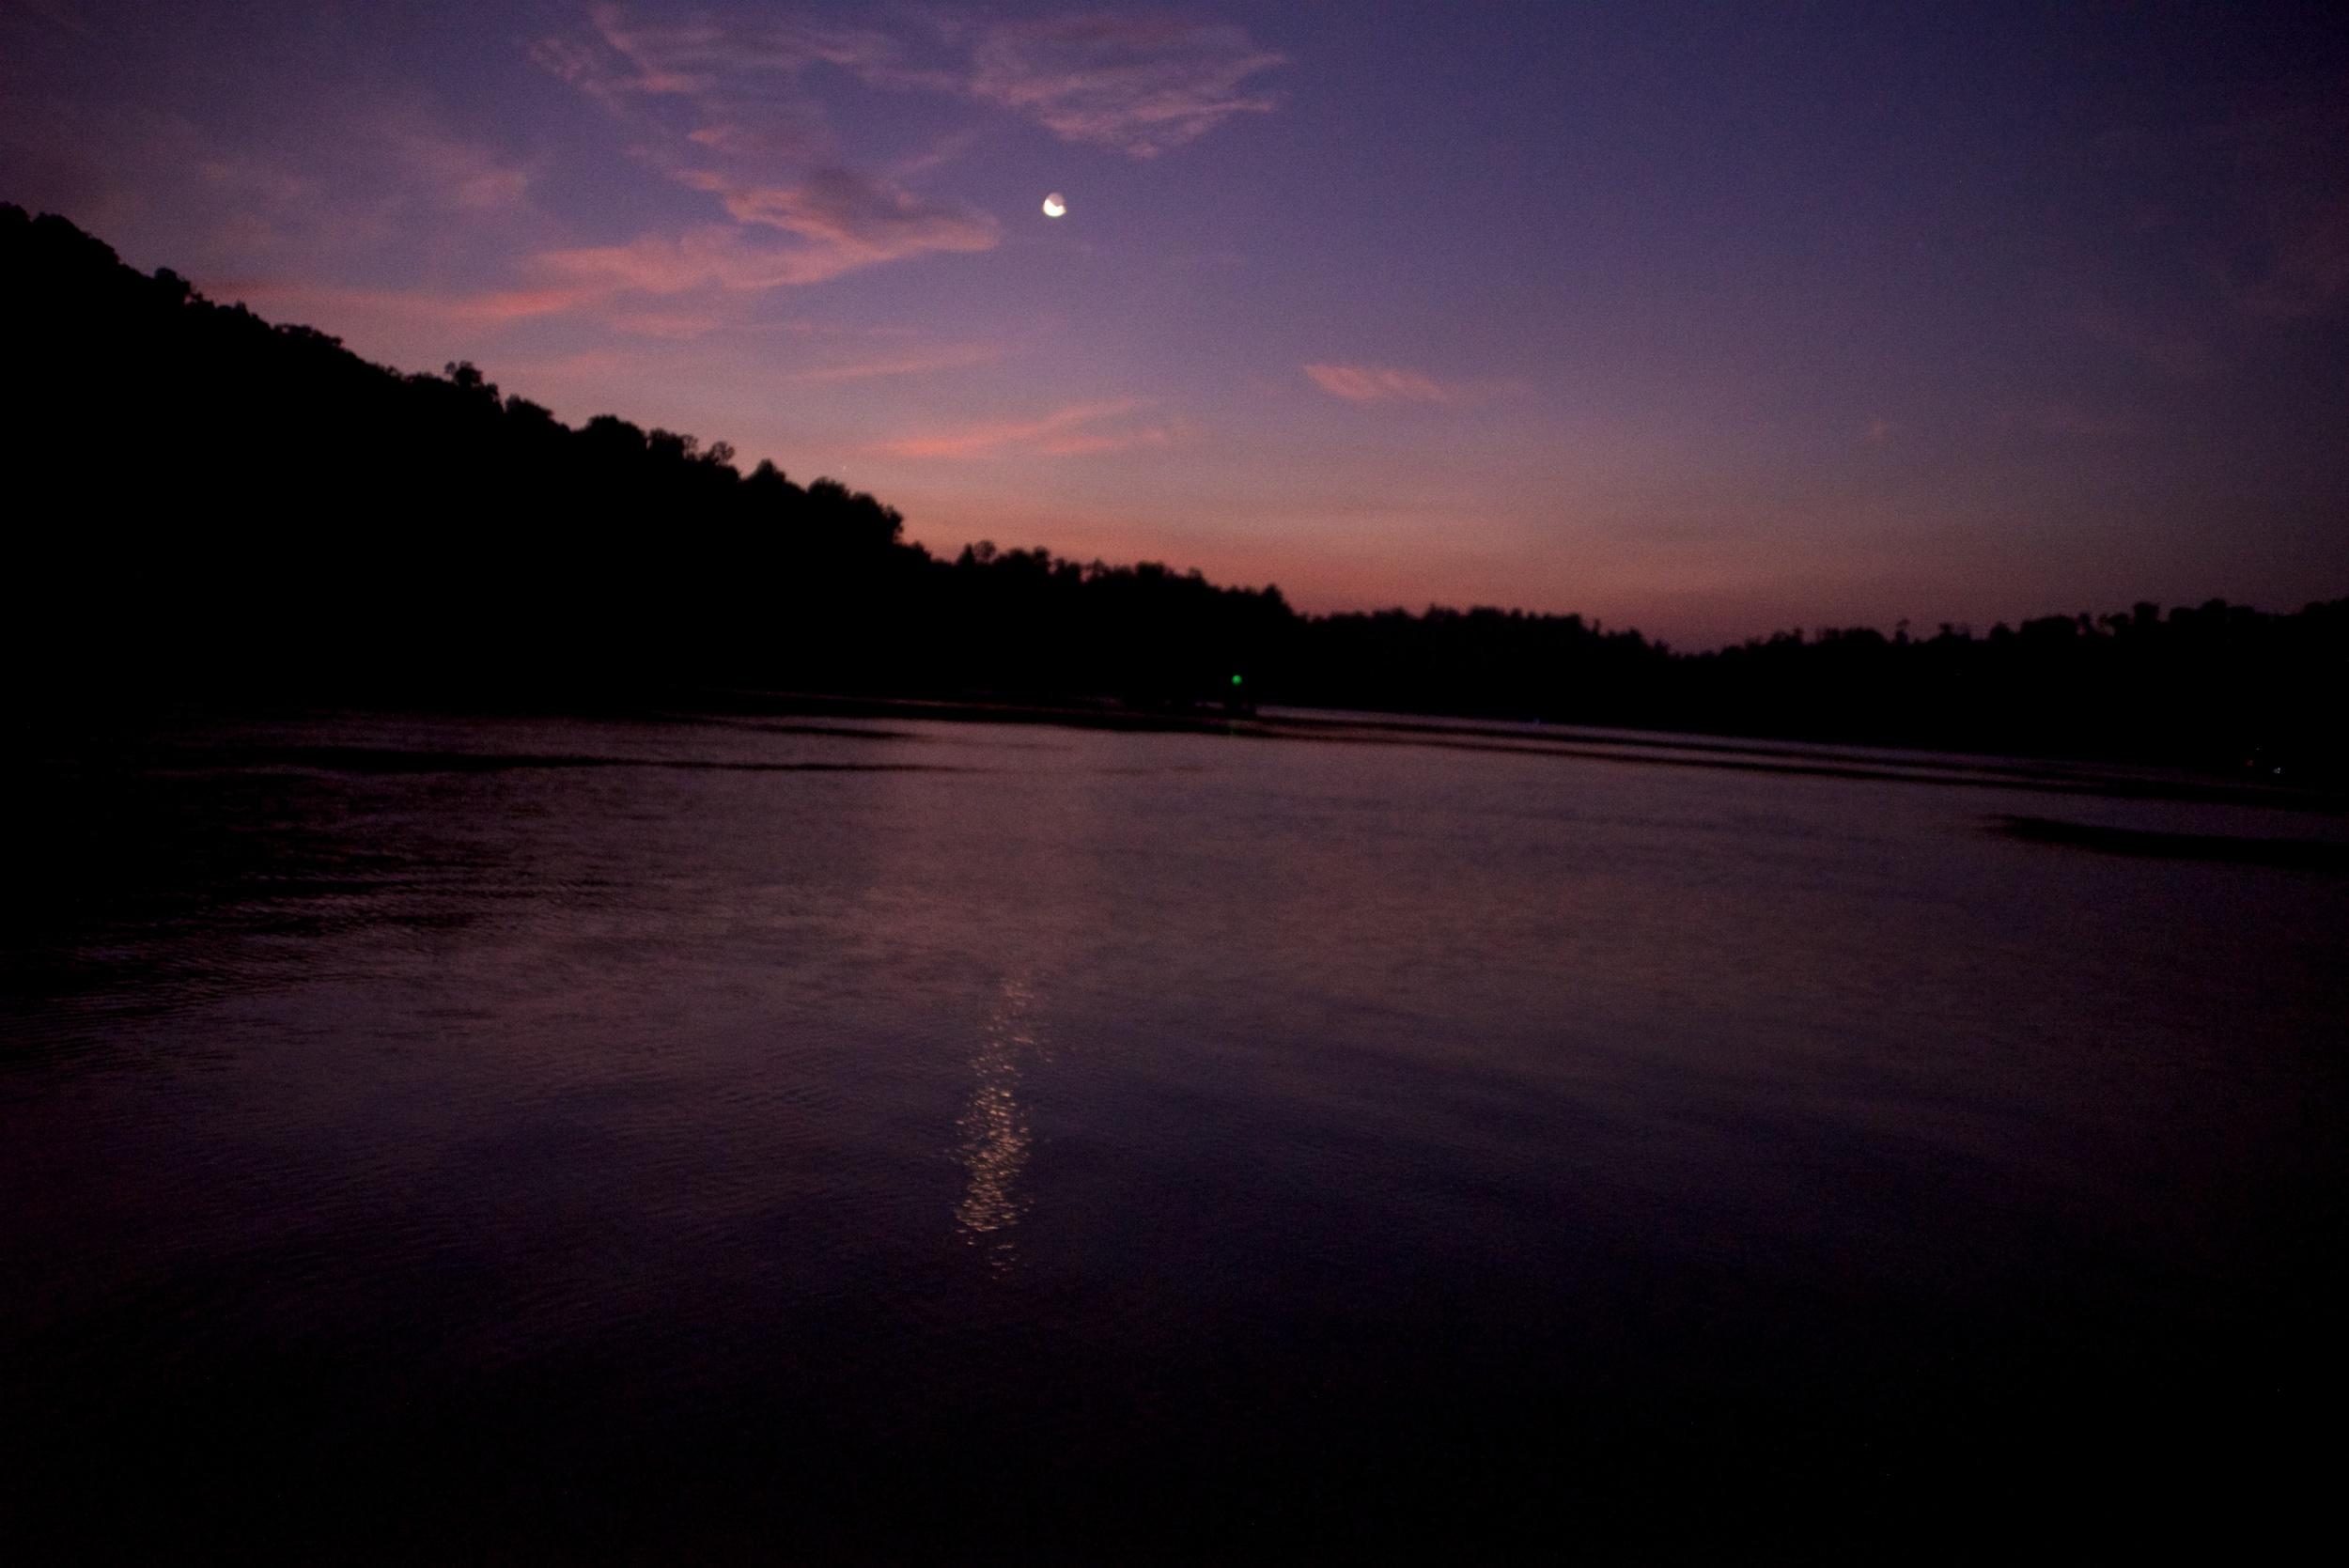 Sunset in the Mergui Archipelago